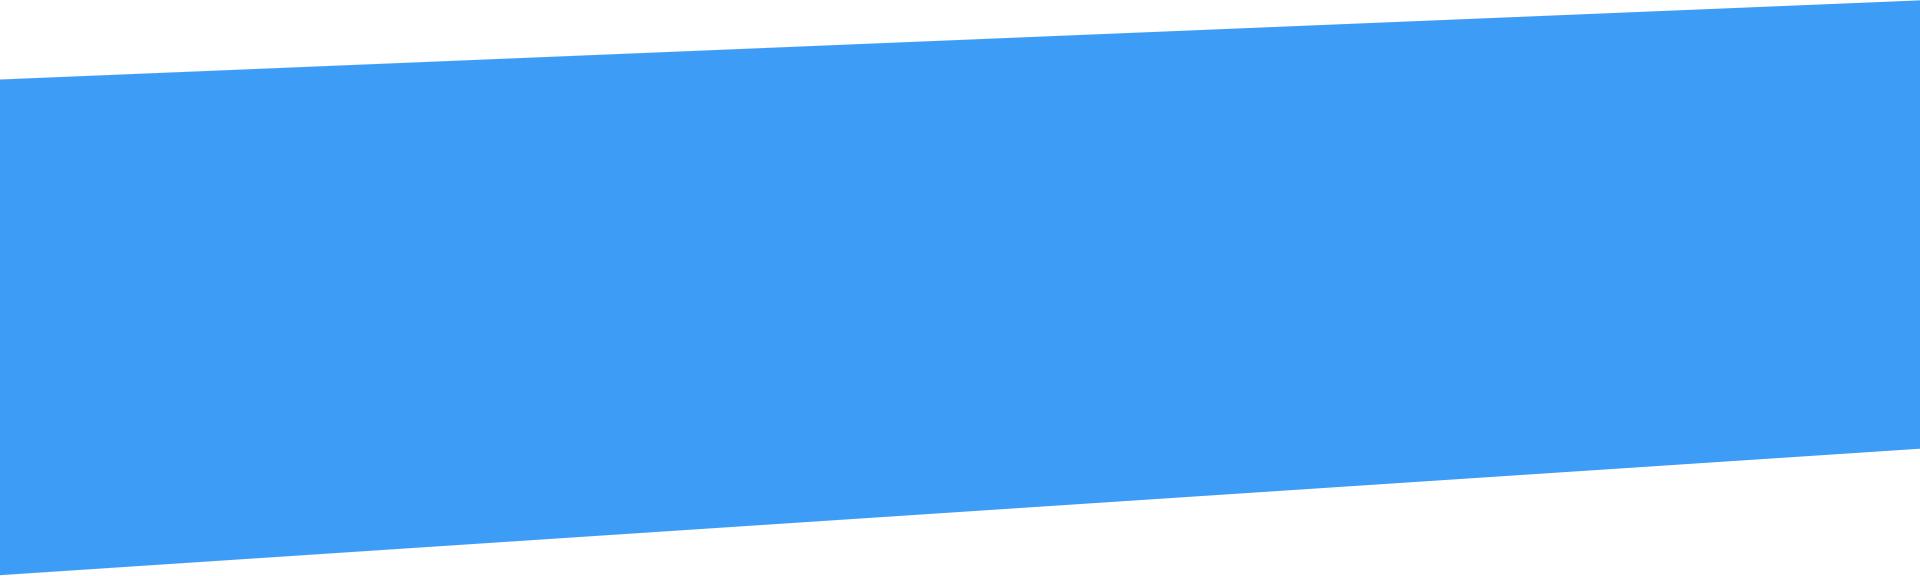 Strip_blue.png